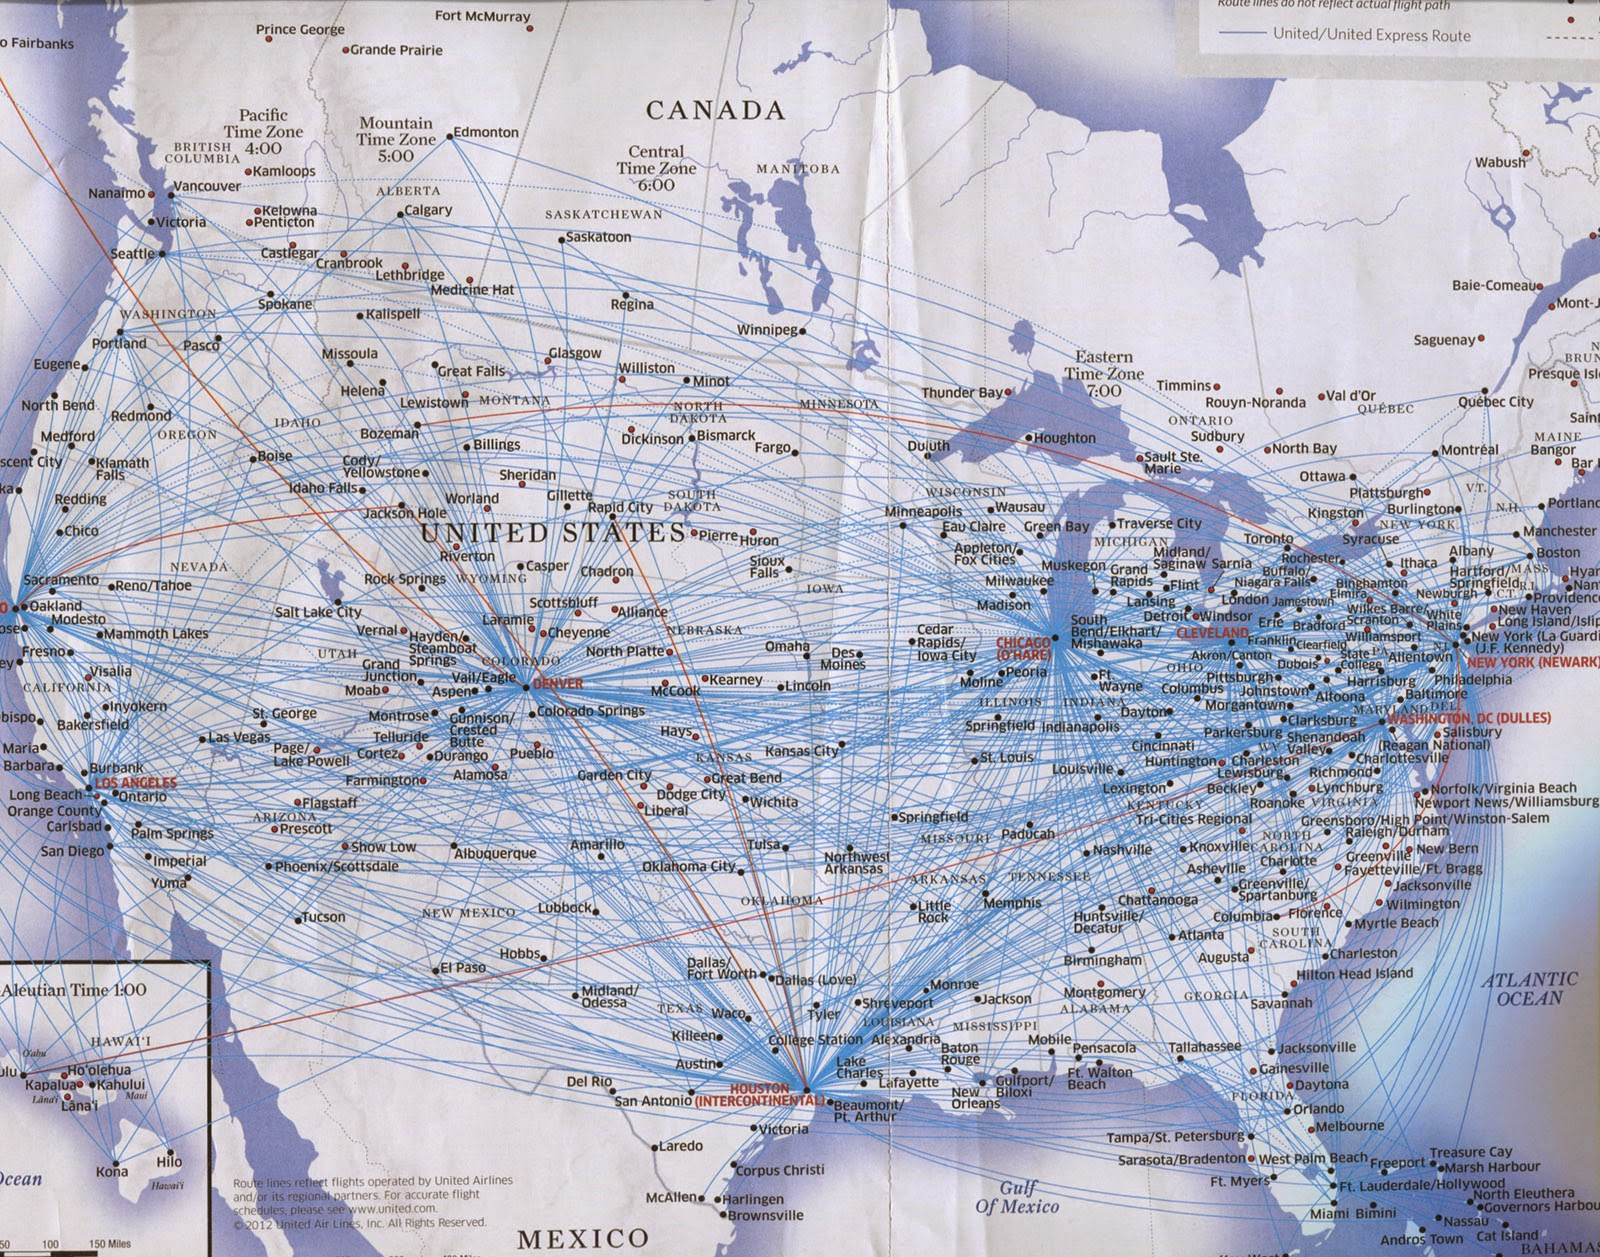 united airline us map 2011 23449 norwegian air